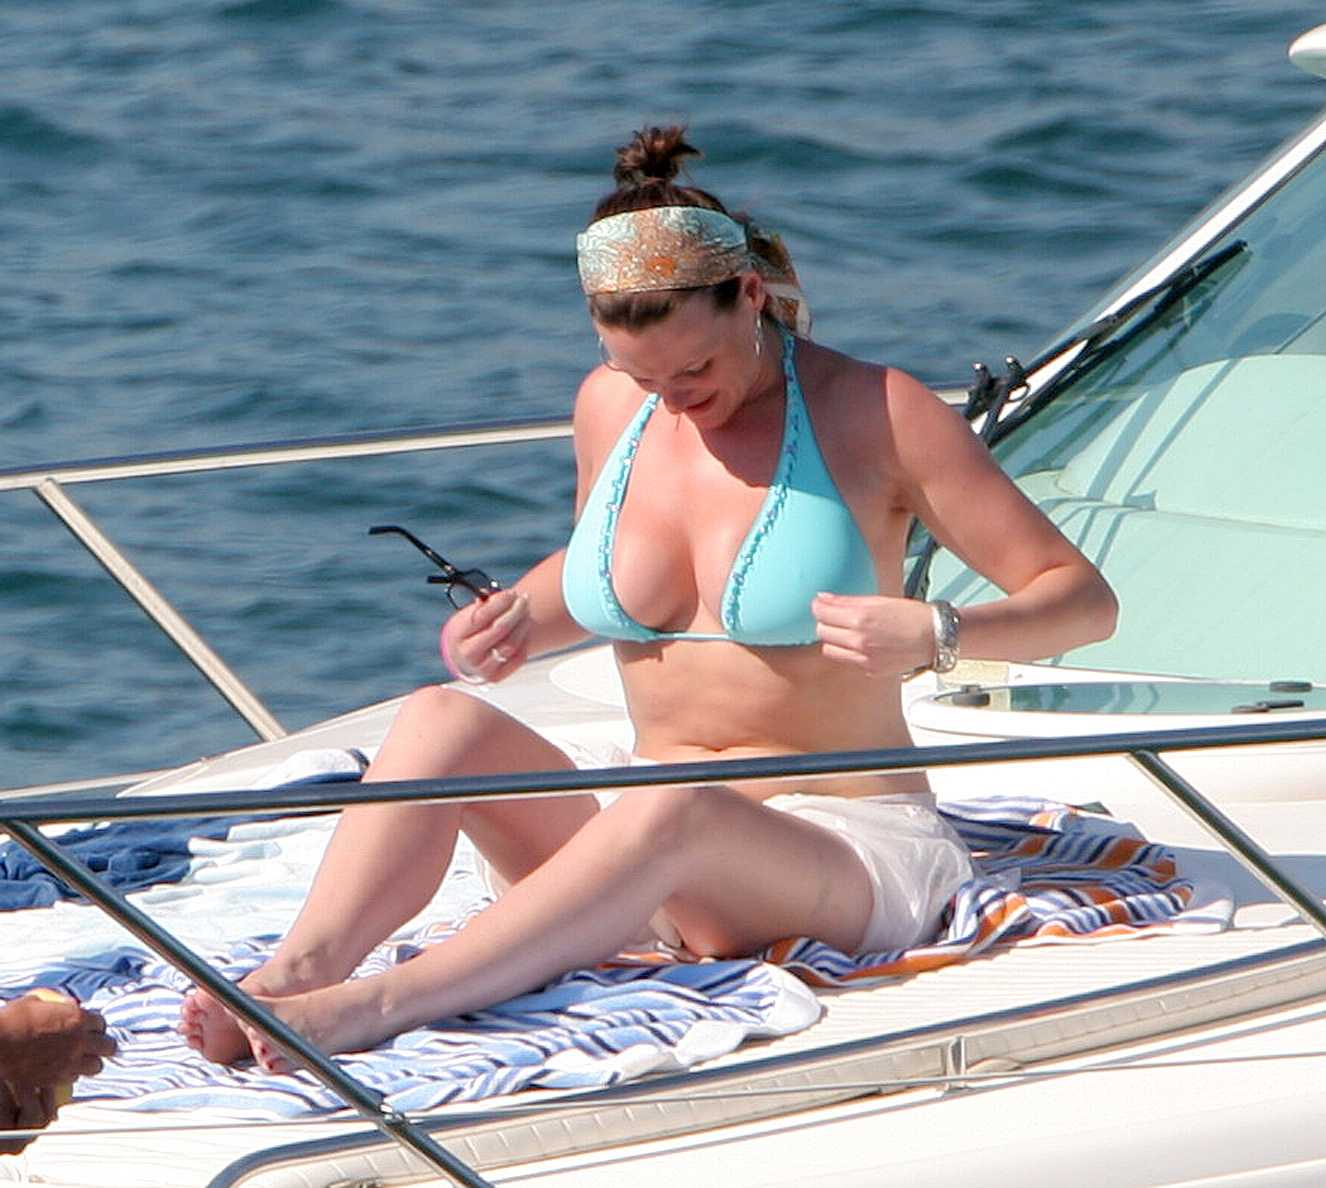 Suranne Jones hot cleavage pic (2)